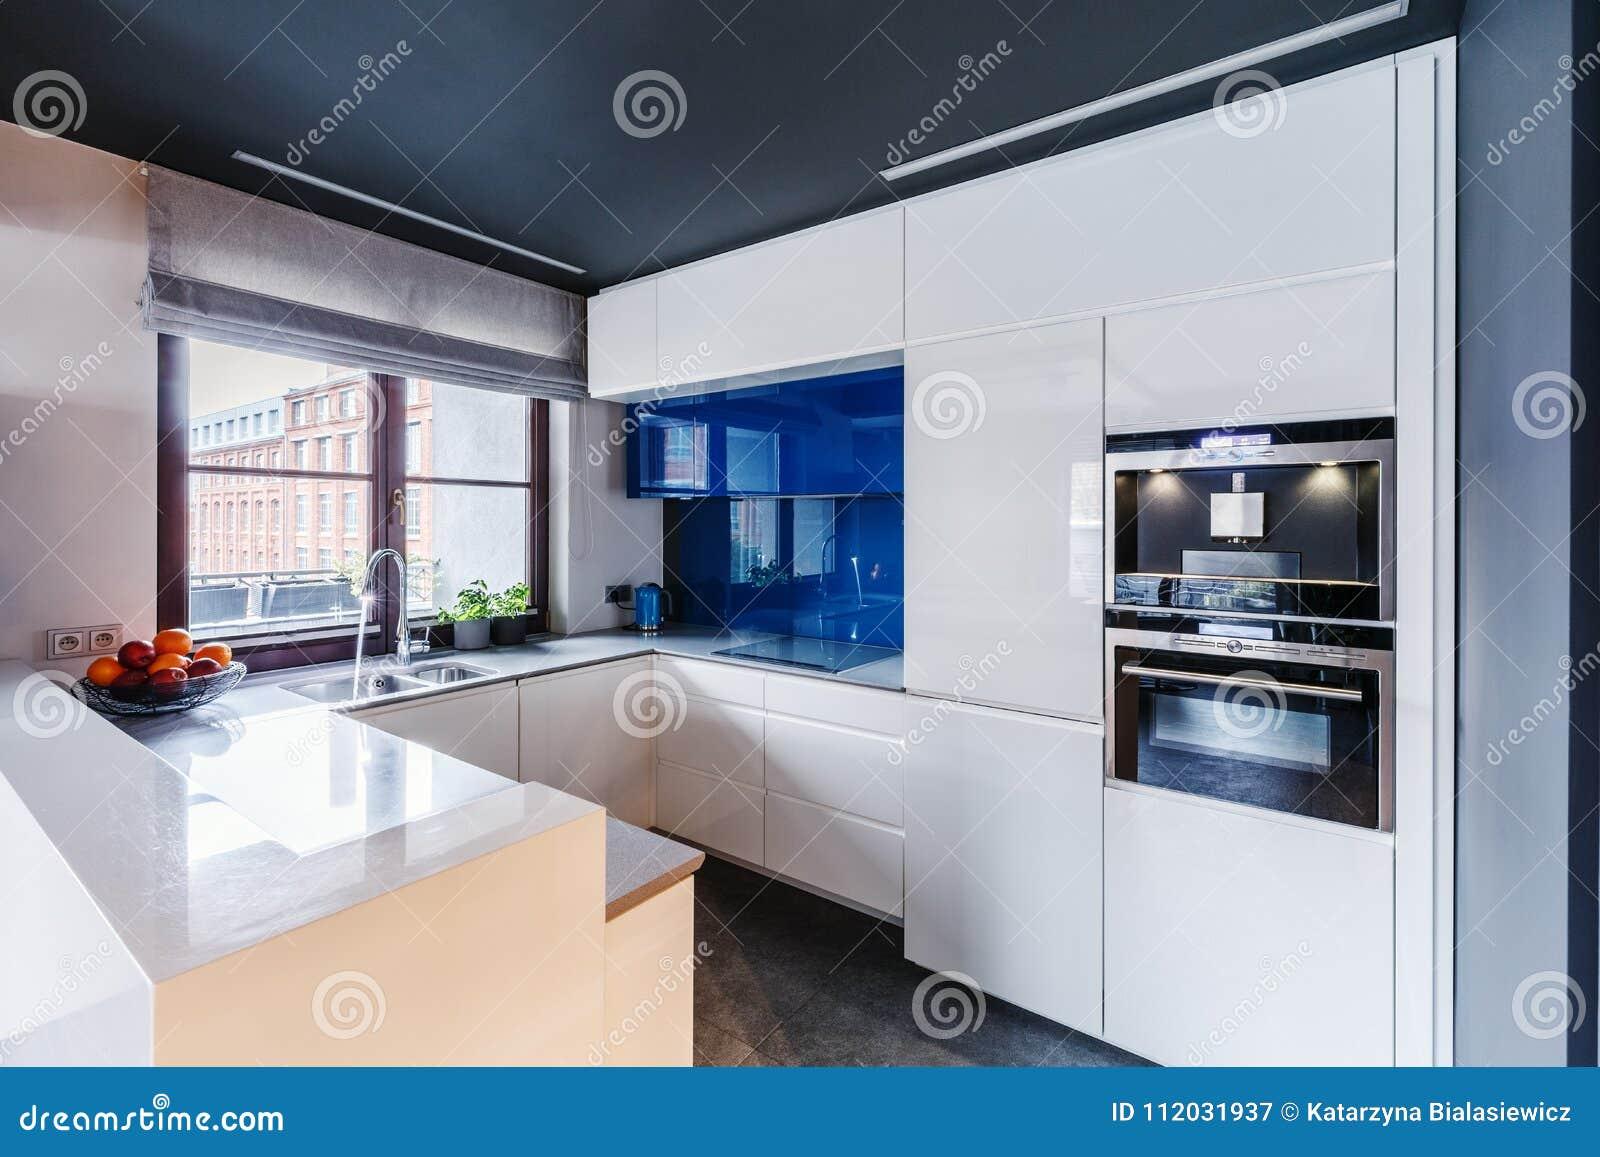 Cuisine Blanche Et Bleu cuisine blanche et bleue image stock. image du bleu - 112031937